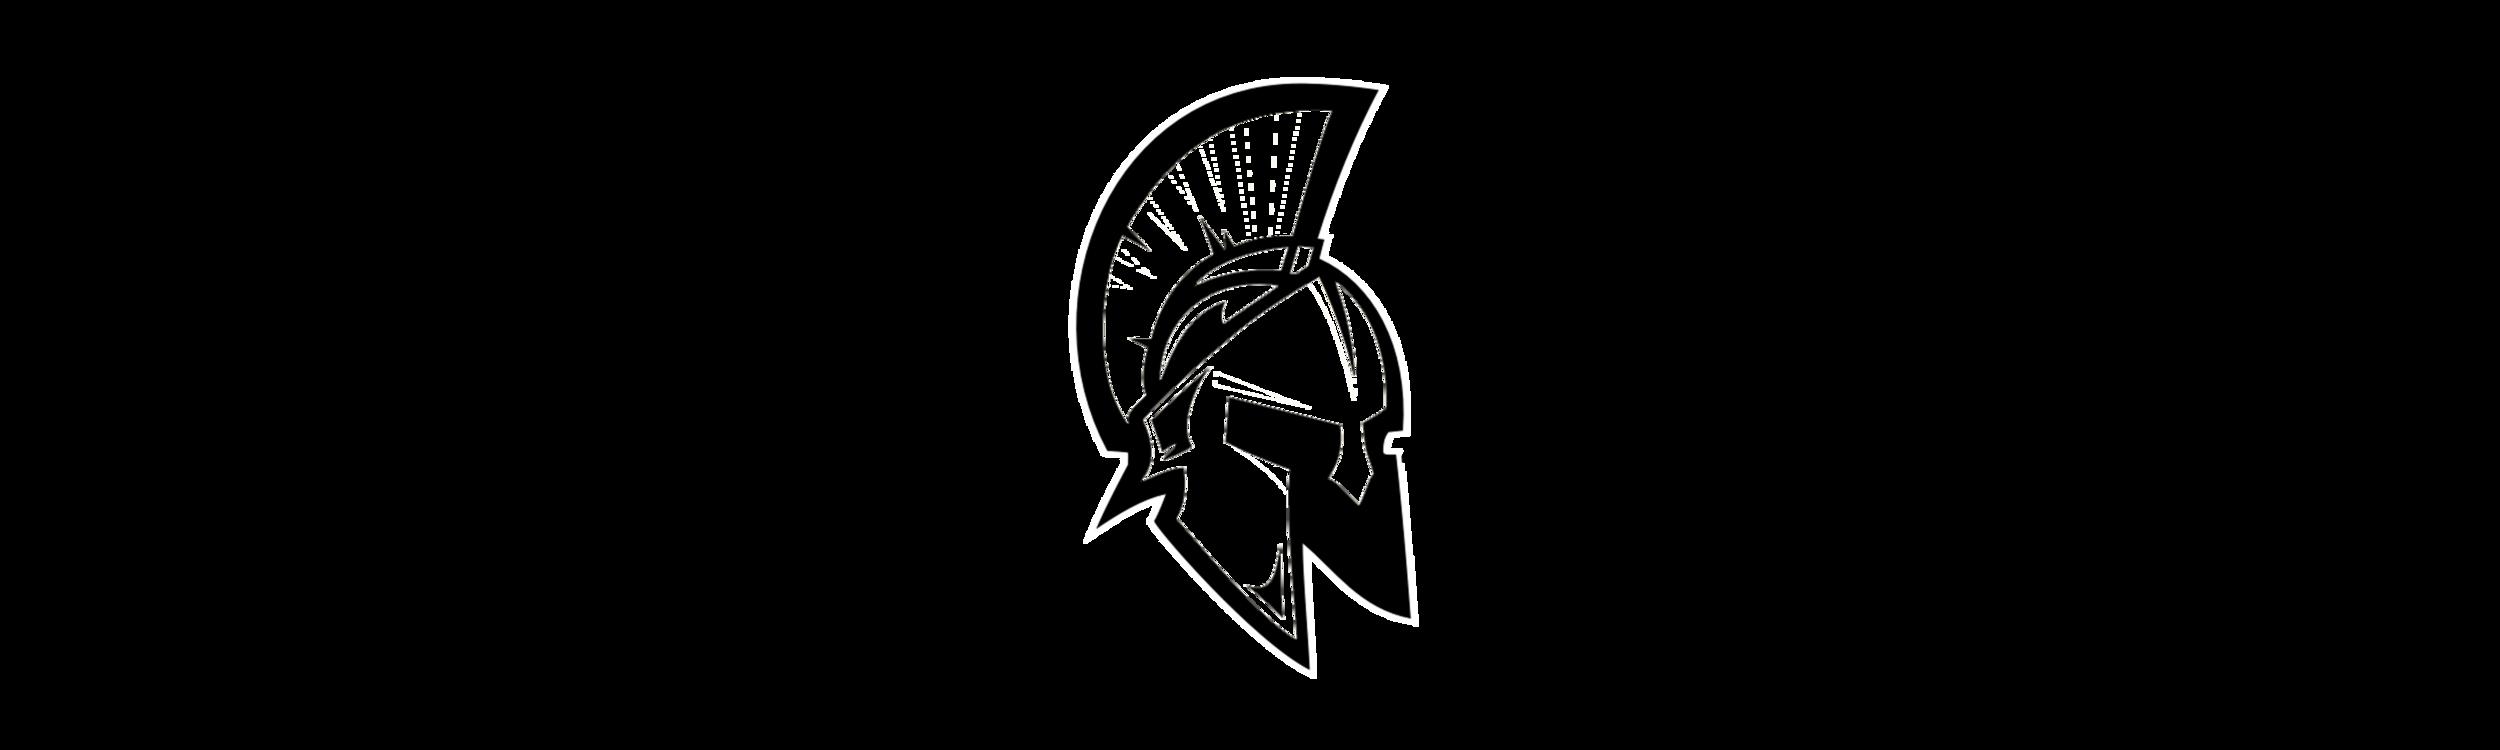 Forerunner Logo.png